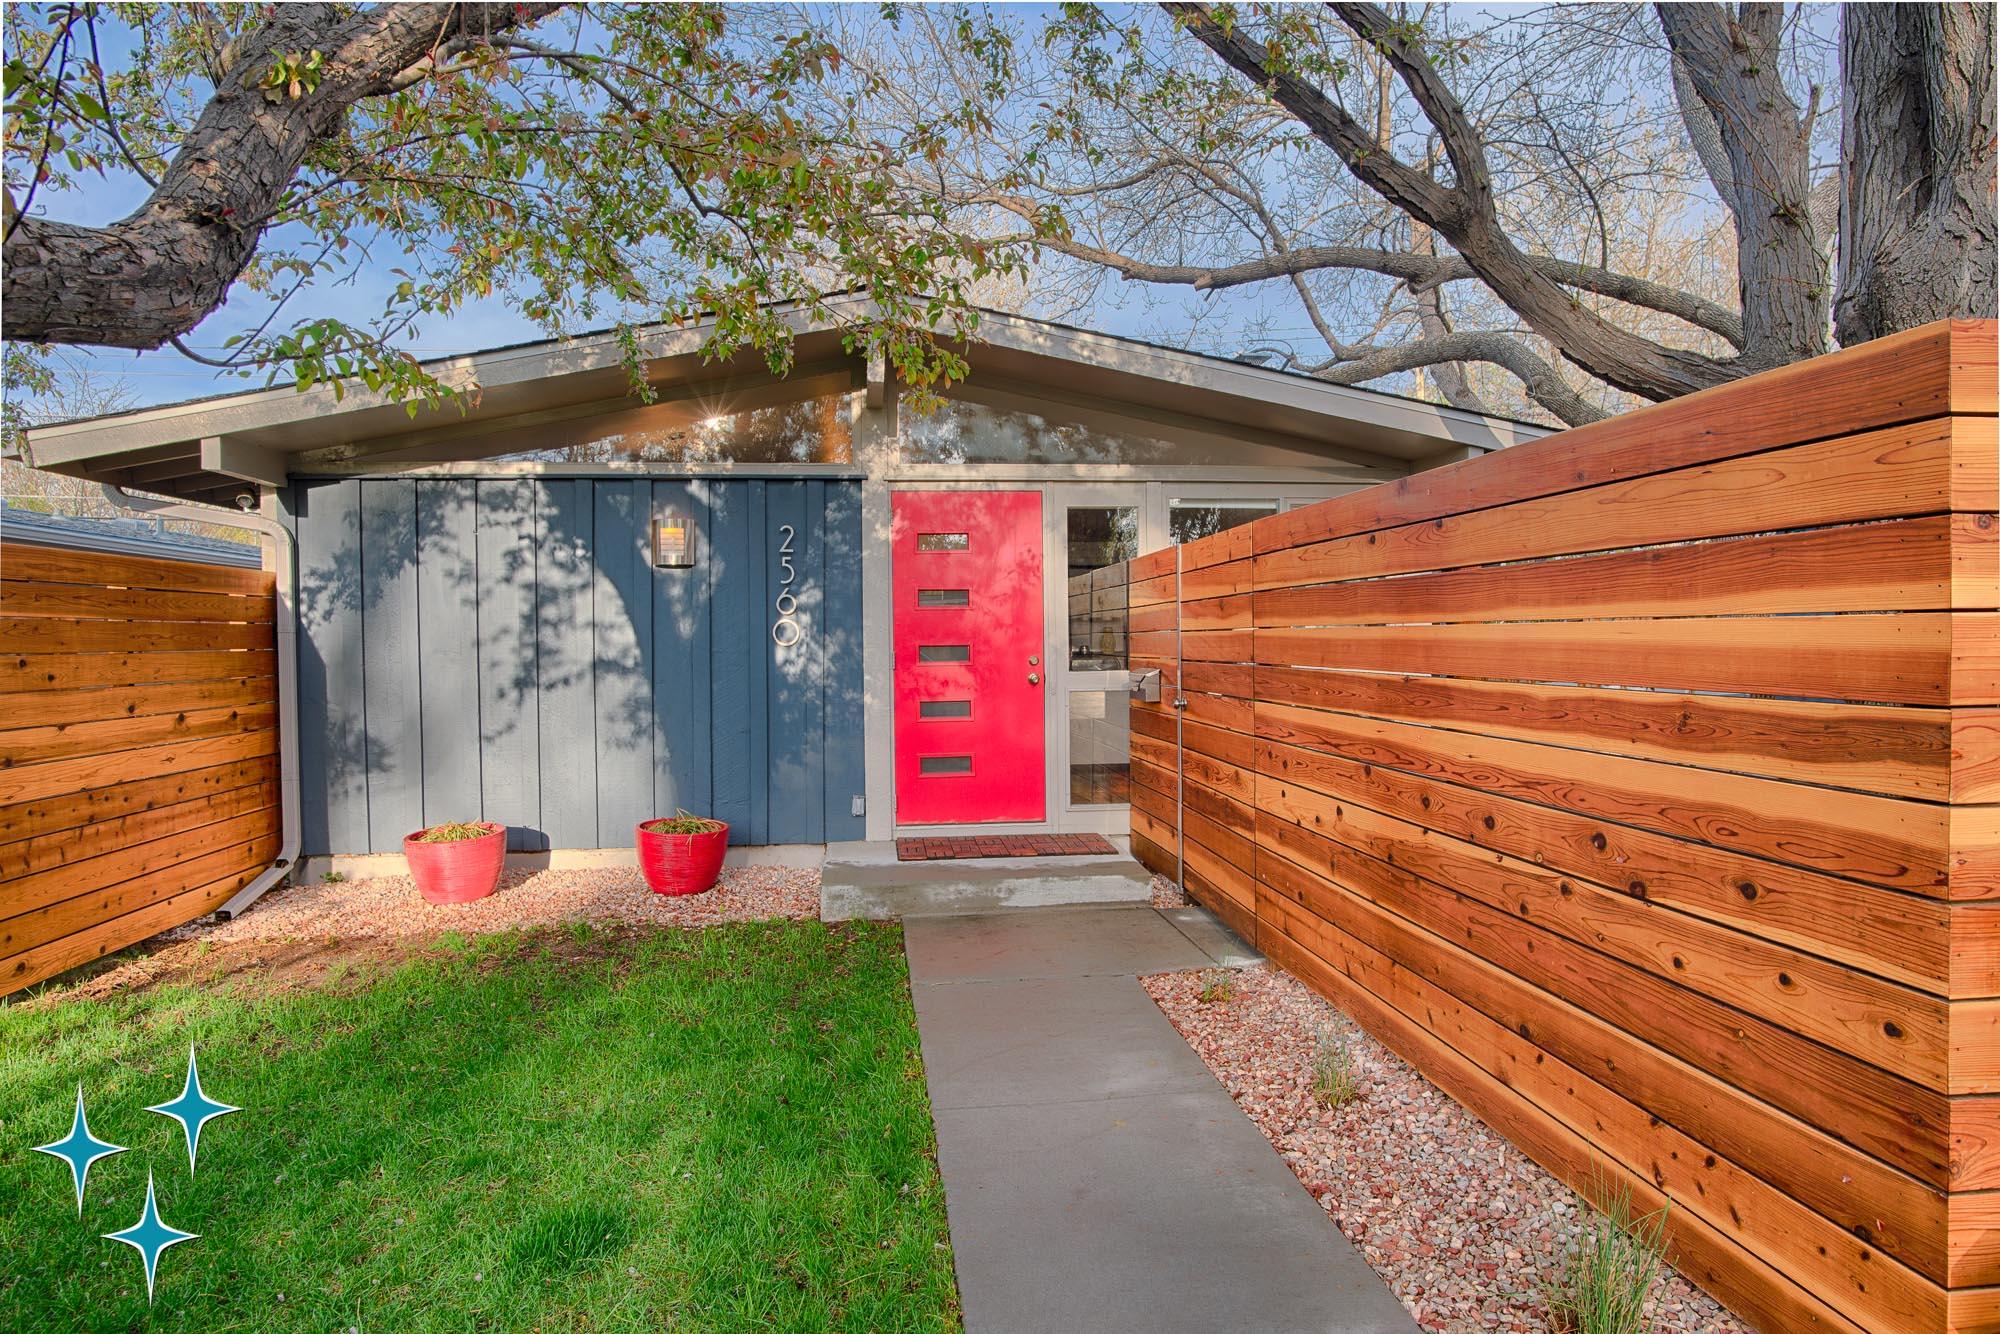 Adrian-Kinney-2560-S-Newton-Street-Denver-Cliff-May-Harvey-Park-2000w50-3SWM-4.jpg